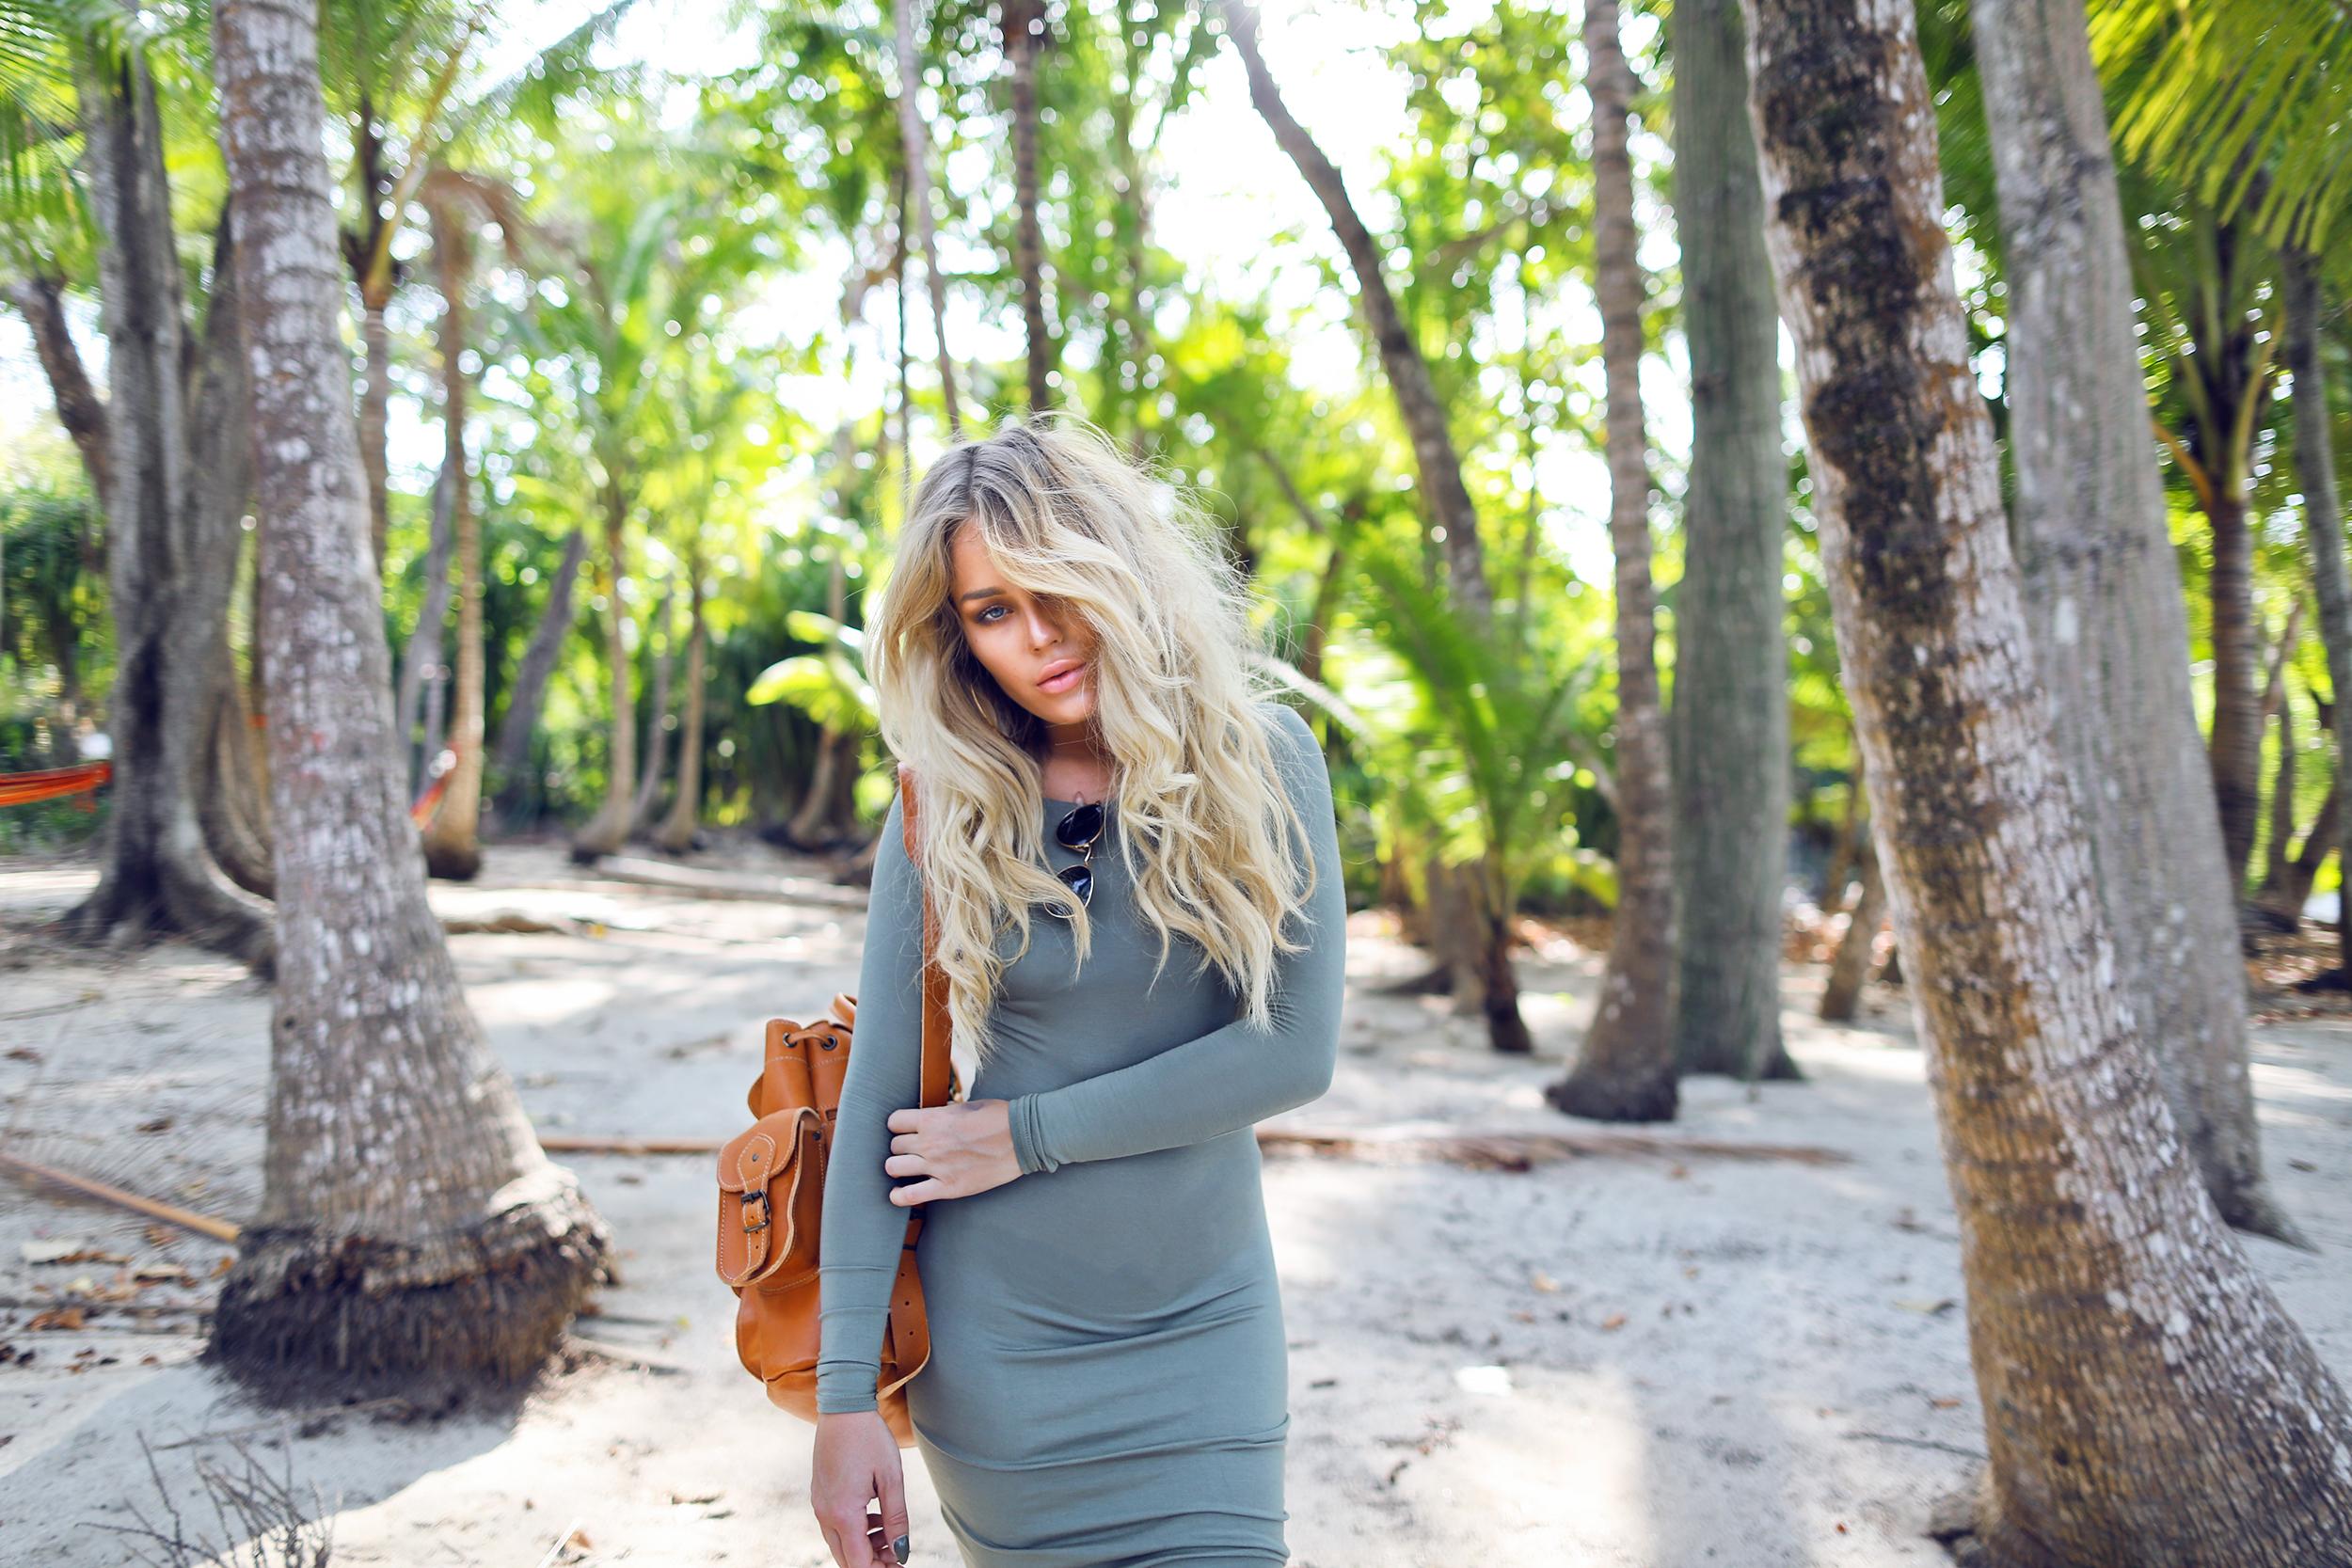 palmtrees_blick3